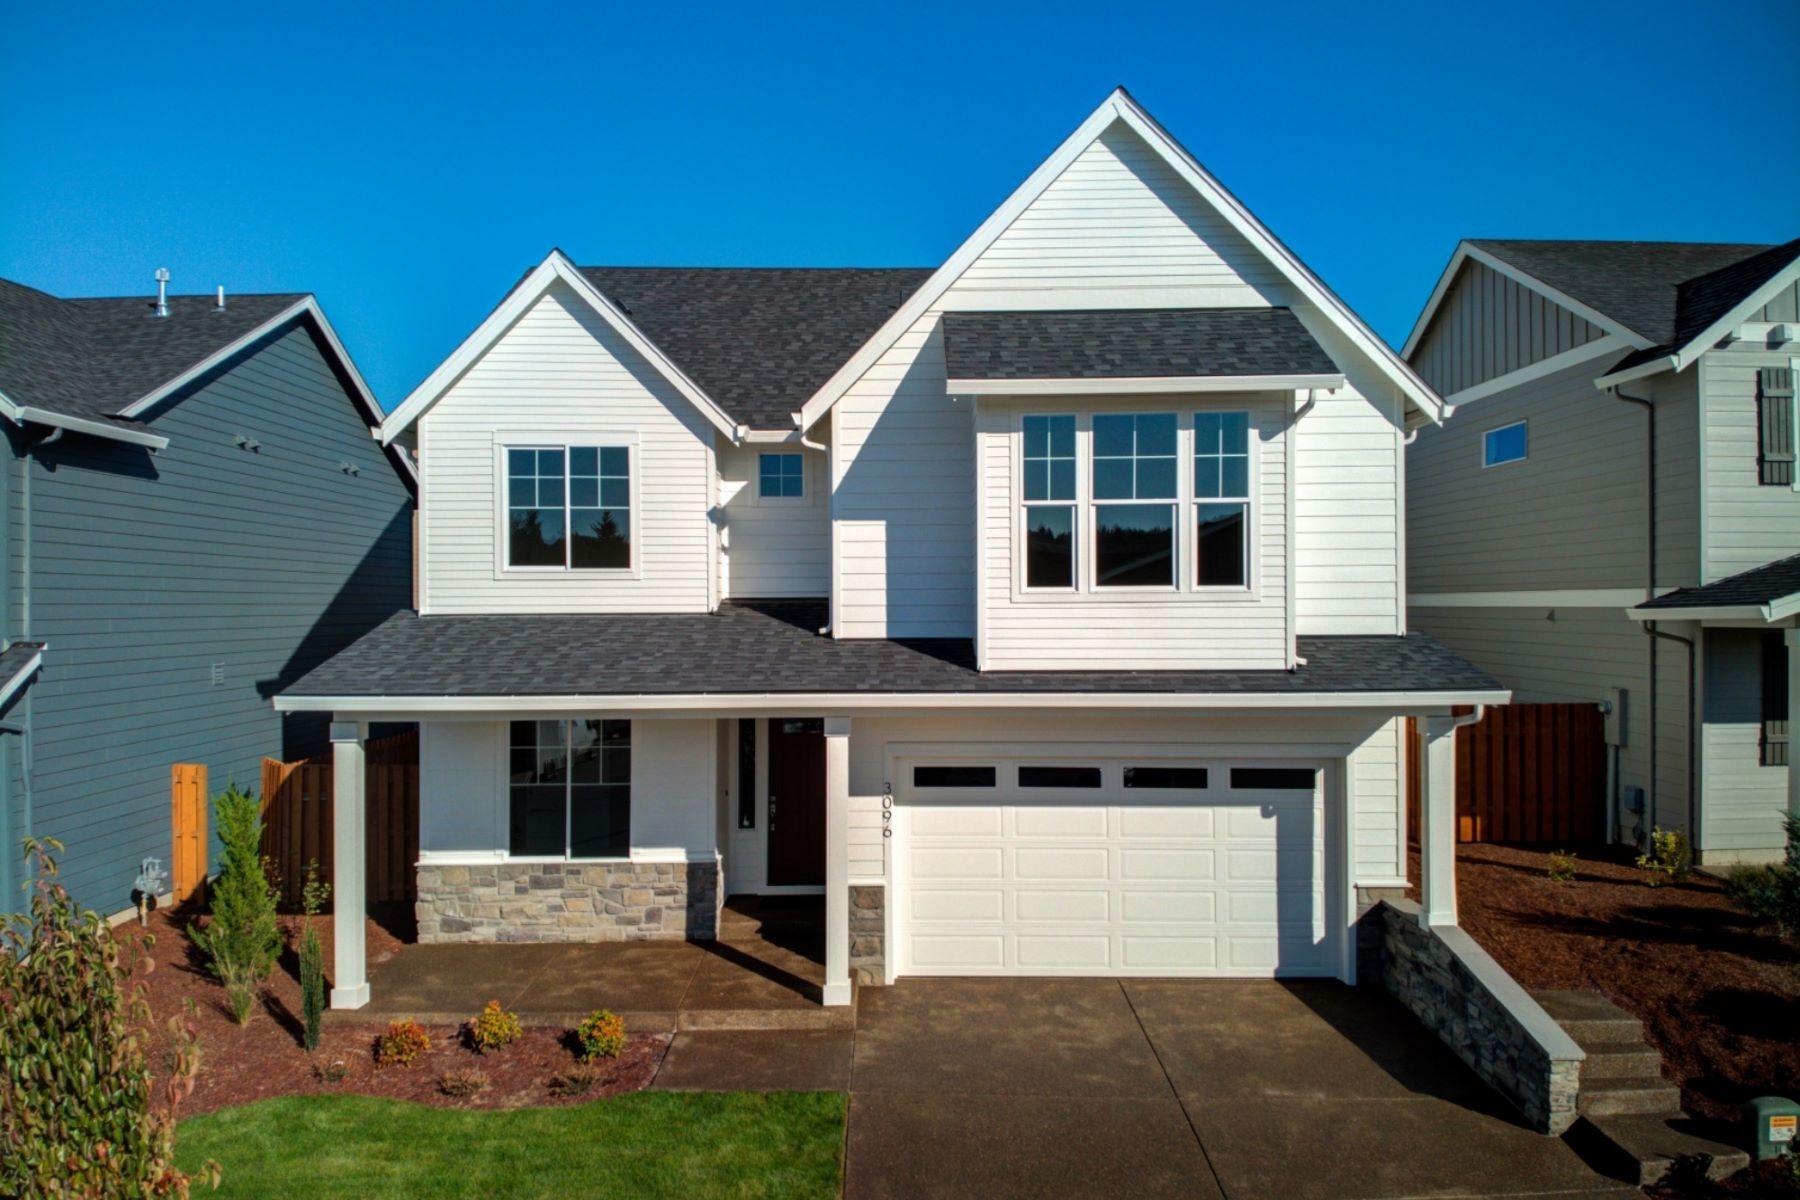 Single Family Homes for Active at 3096 NW Anastasia St Salem, Oregon 97304 United States